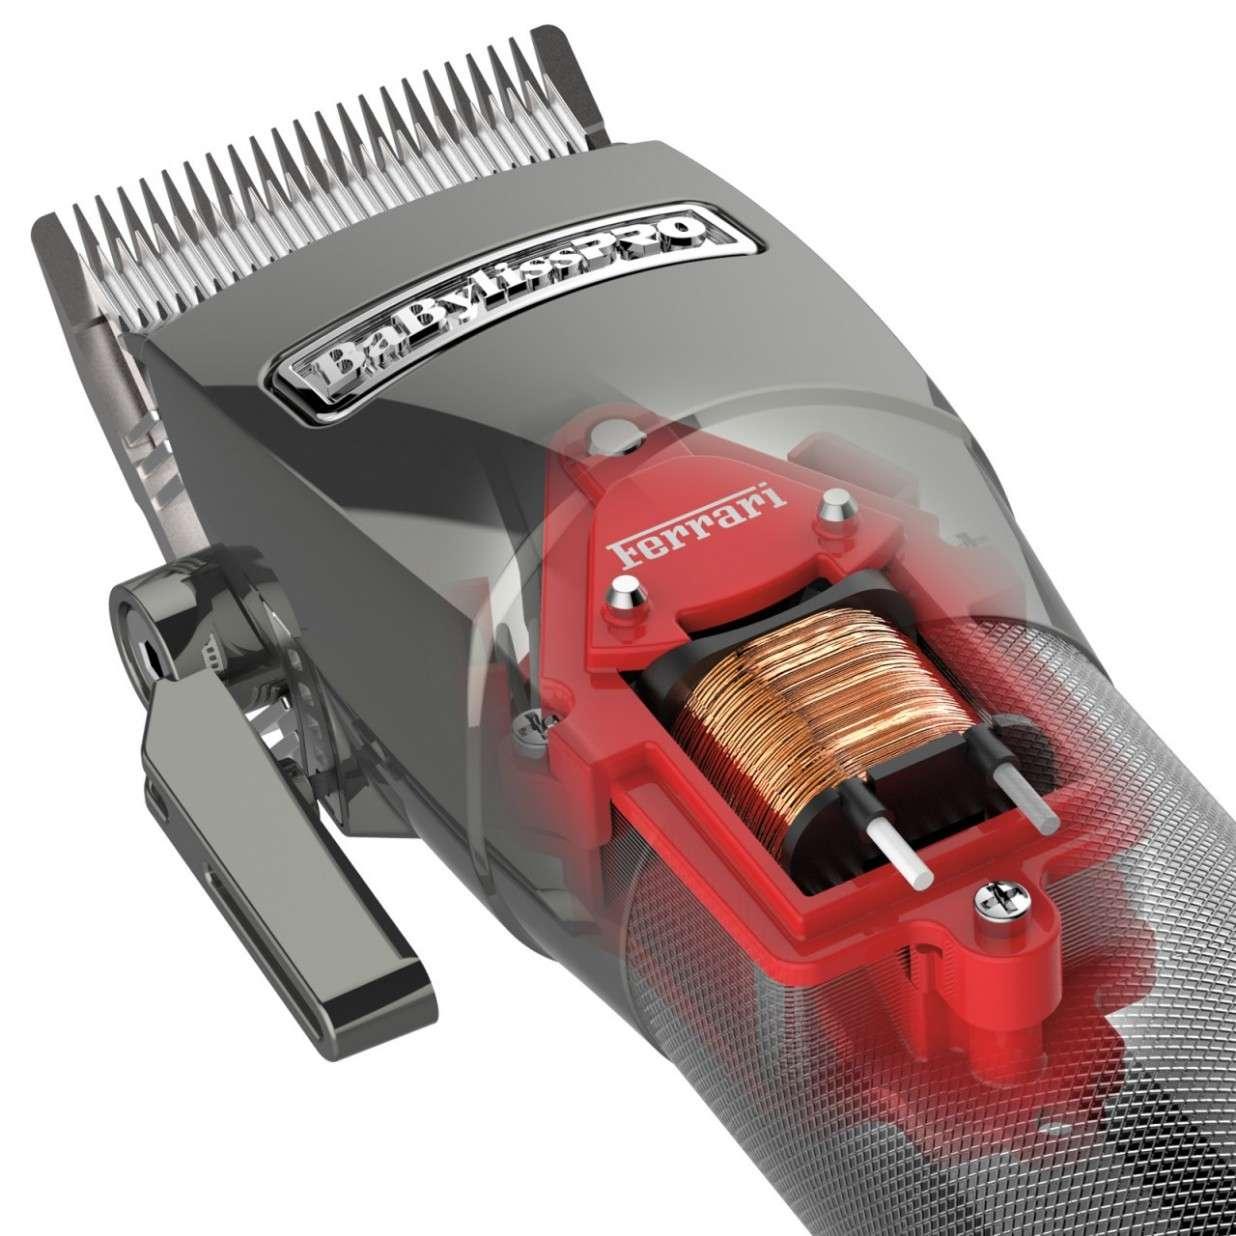 ... Máquina de Corte Profesional Super Fade X880 con Motor Ferrari +  Regalo. Previous 426f874c9262